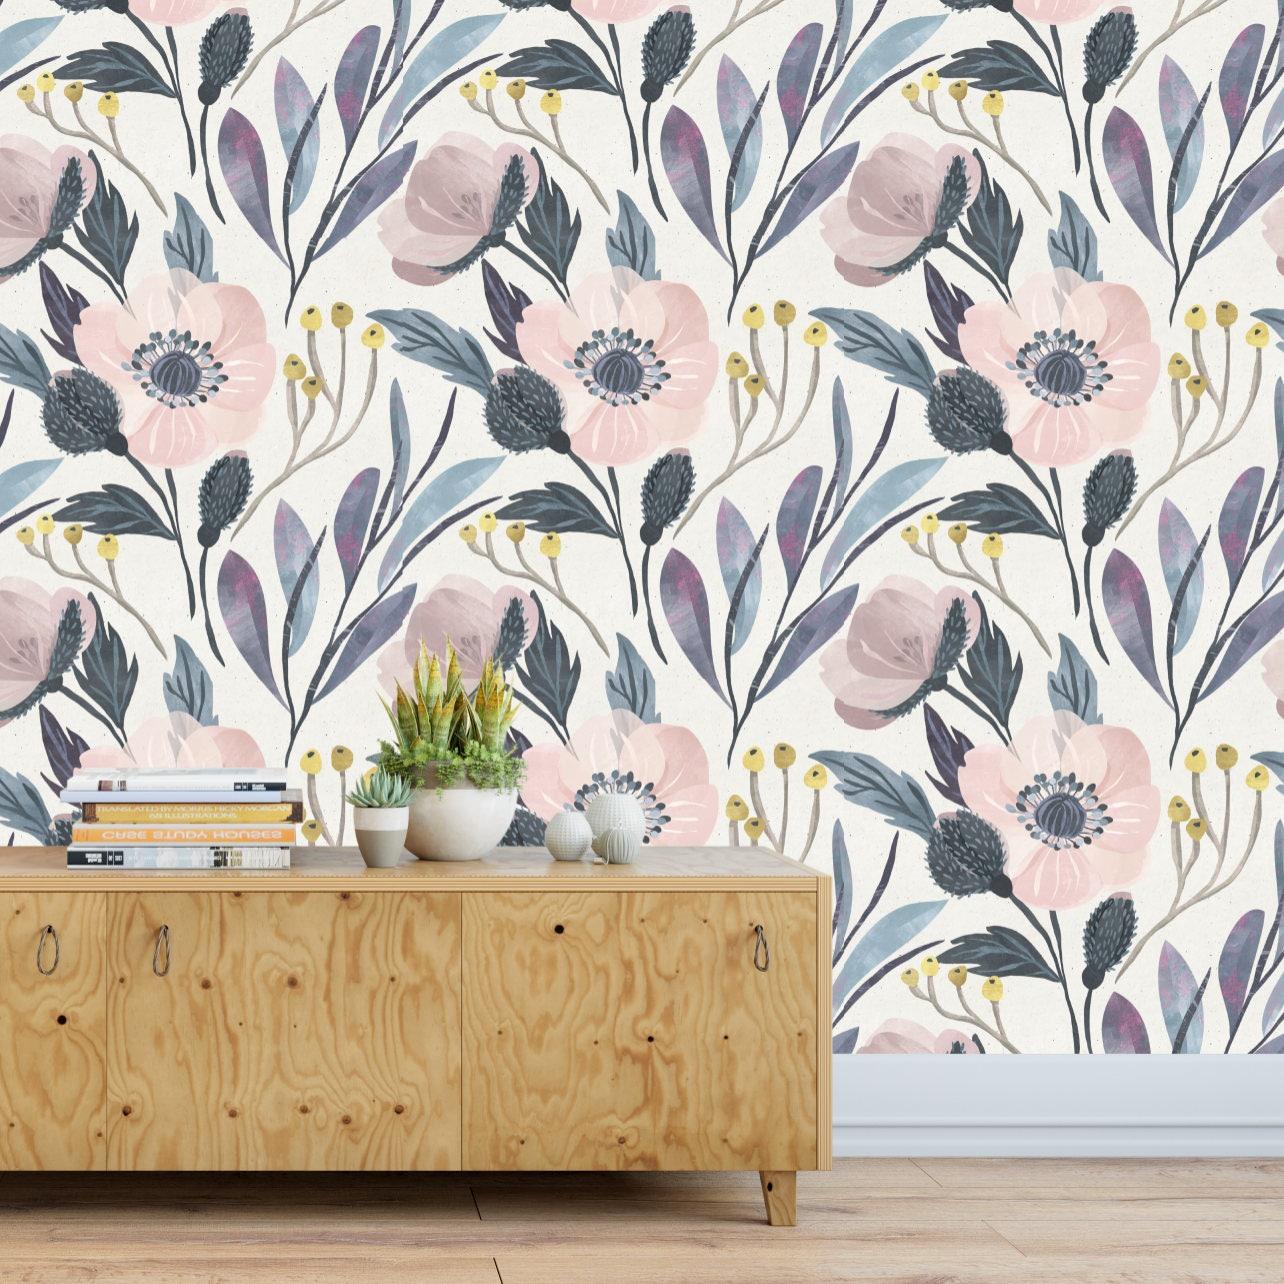 Moody Flower Wallpaper Temporary Wallpaper Removable Etsy